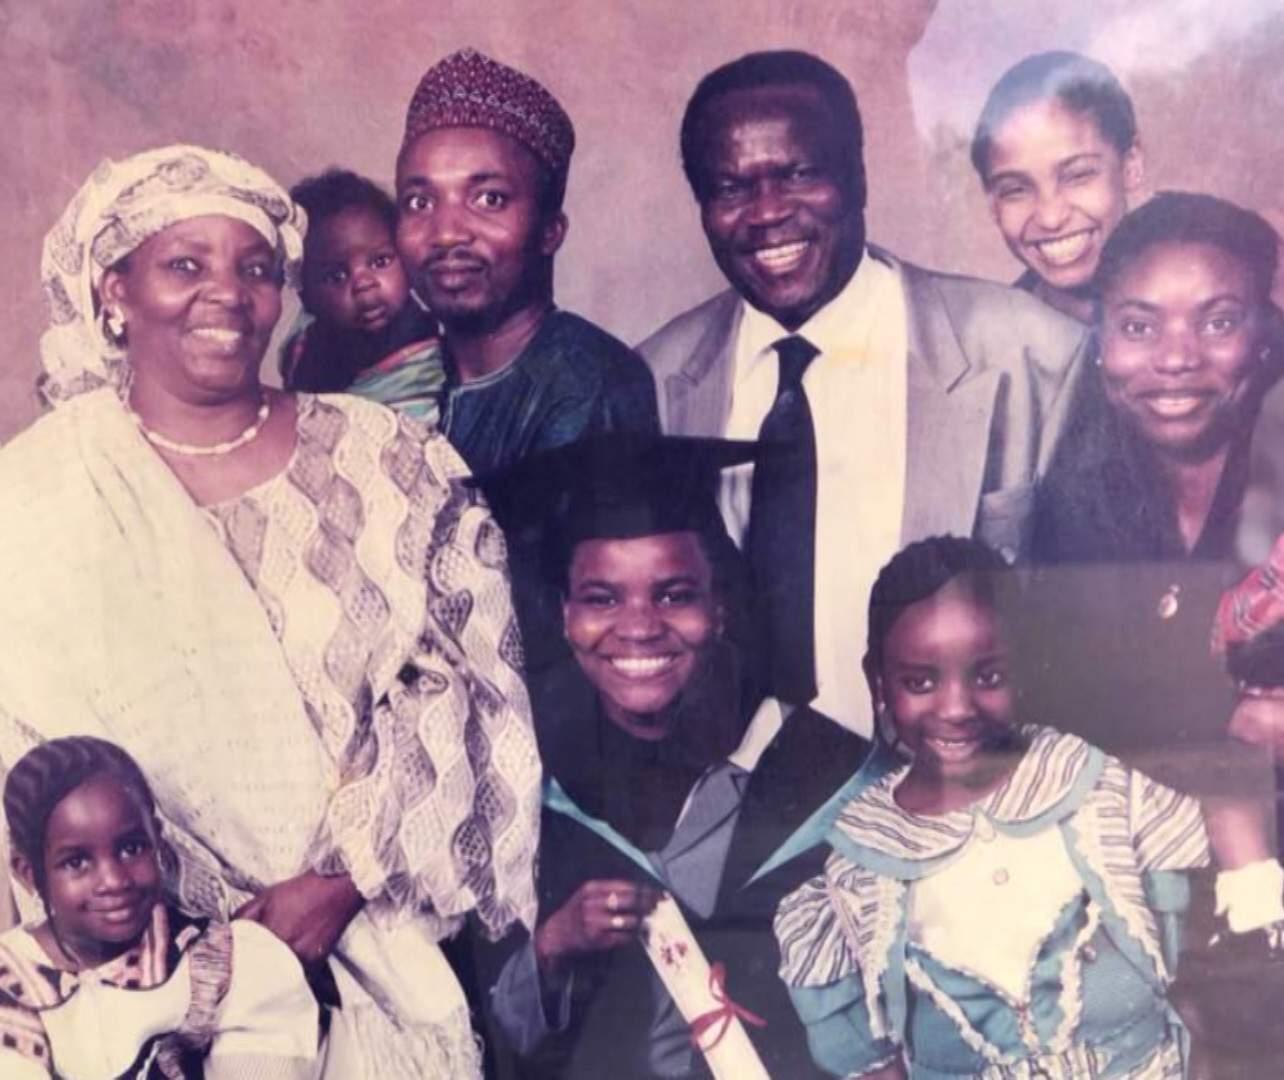 Hadiza Bawa-Garba and family